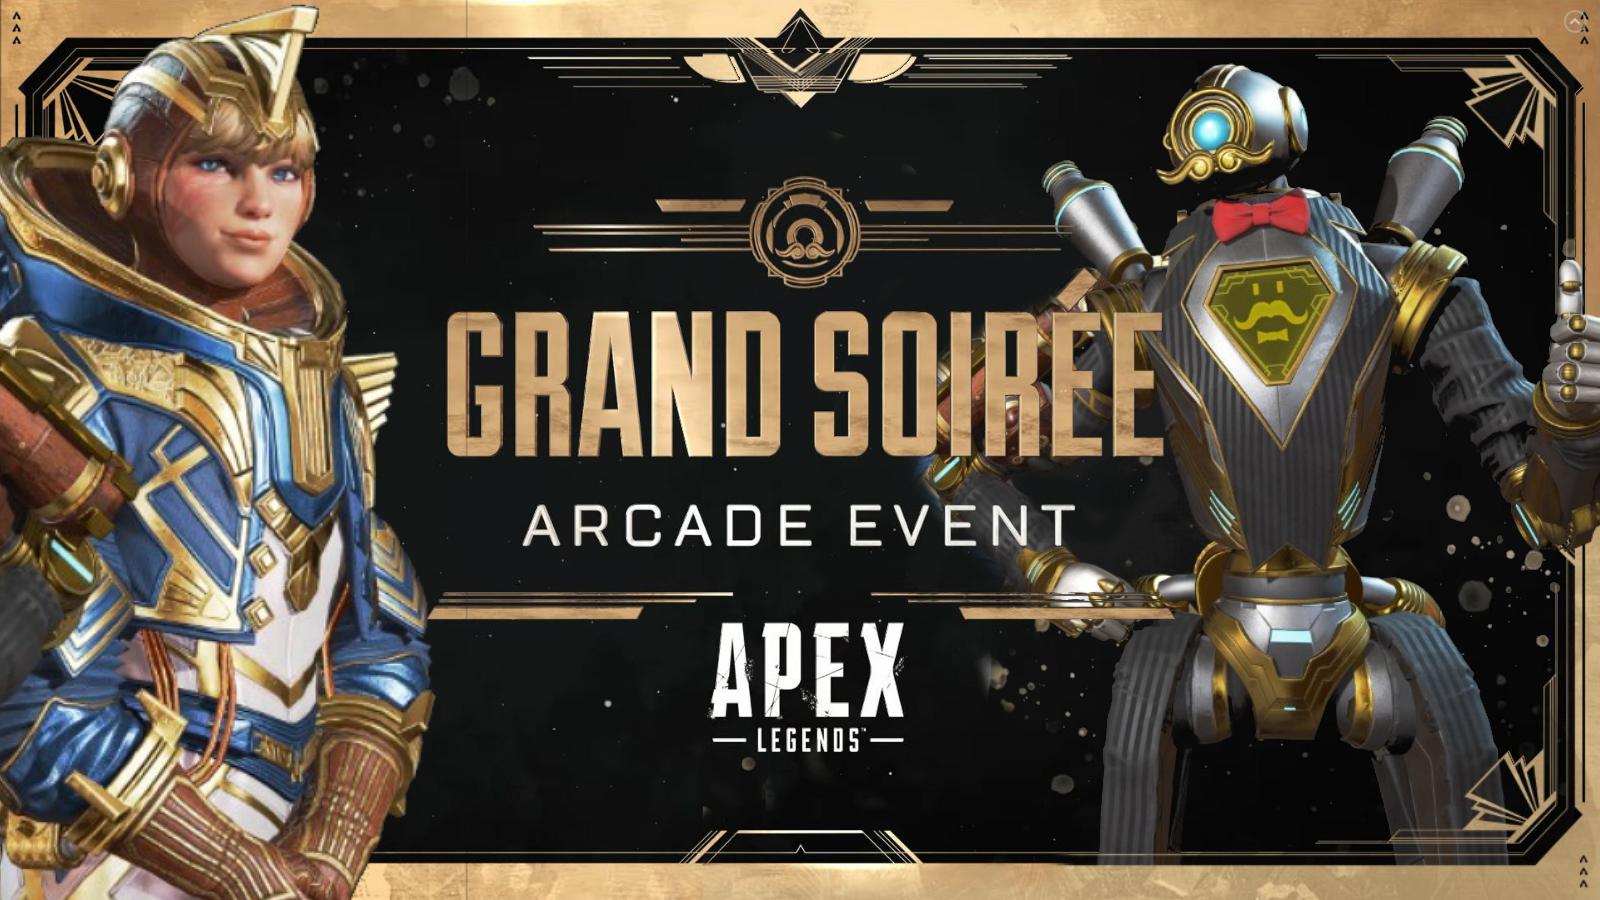 Apex Legends Grand Soiree event.